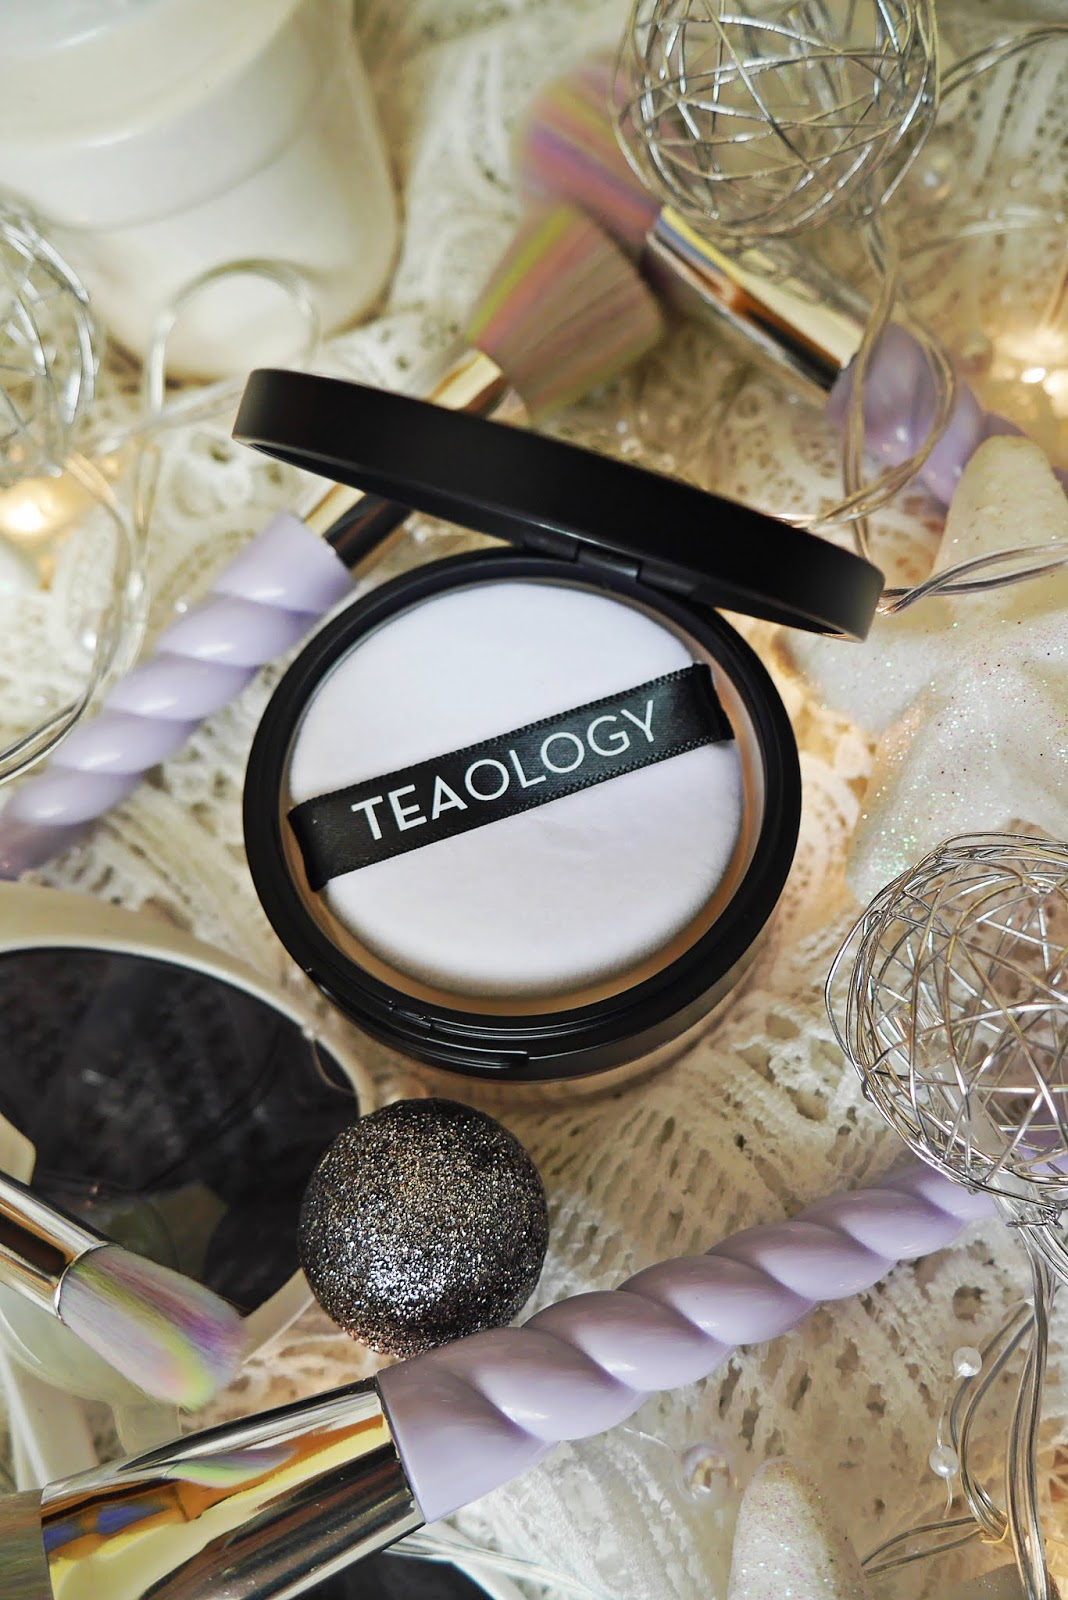 teaology puder z białą herbatą matujący blogerka urodowa blogerka modowa makeup karyn